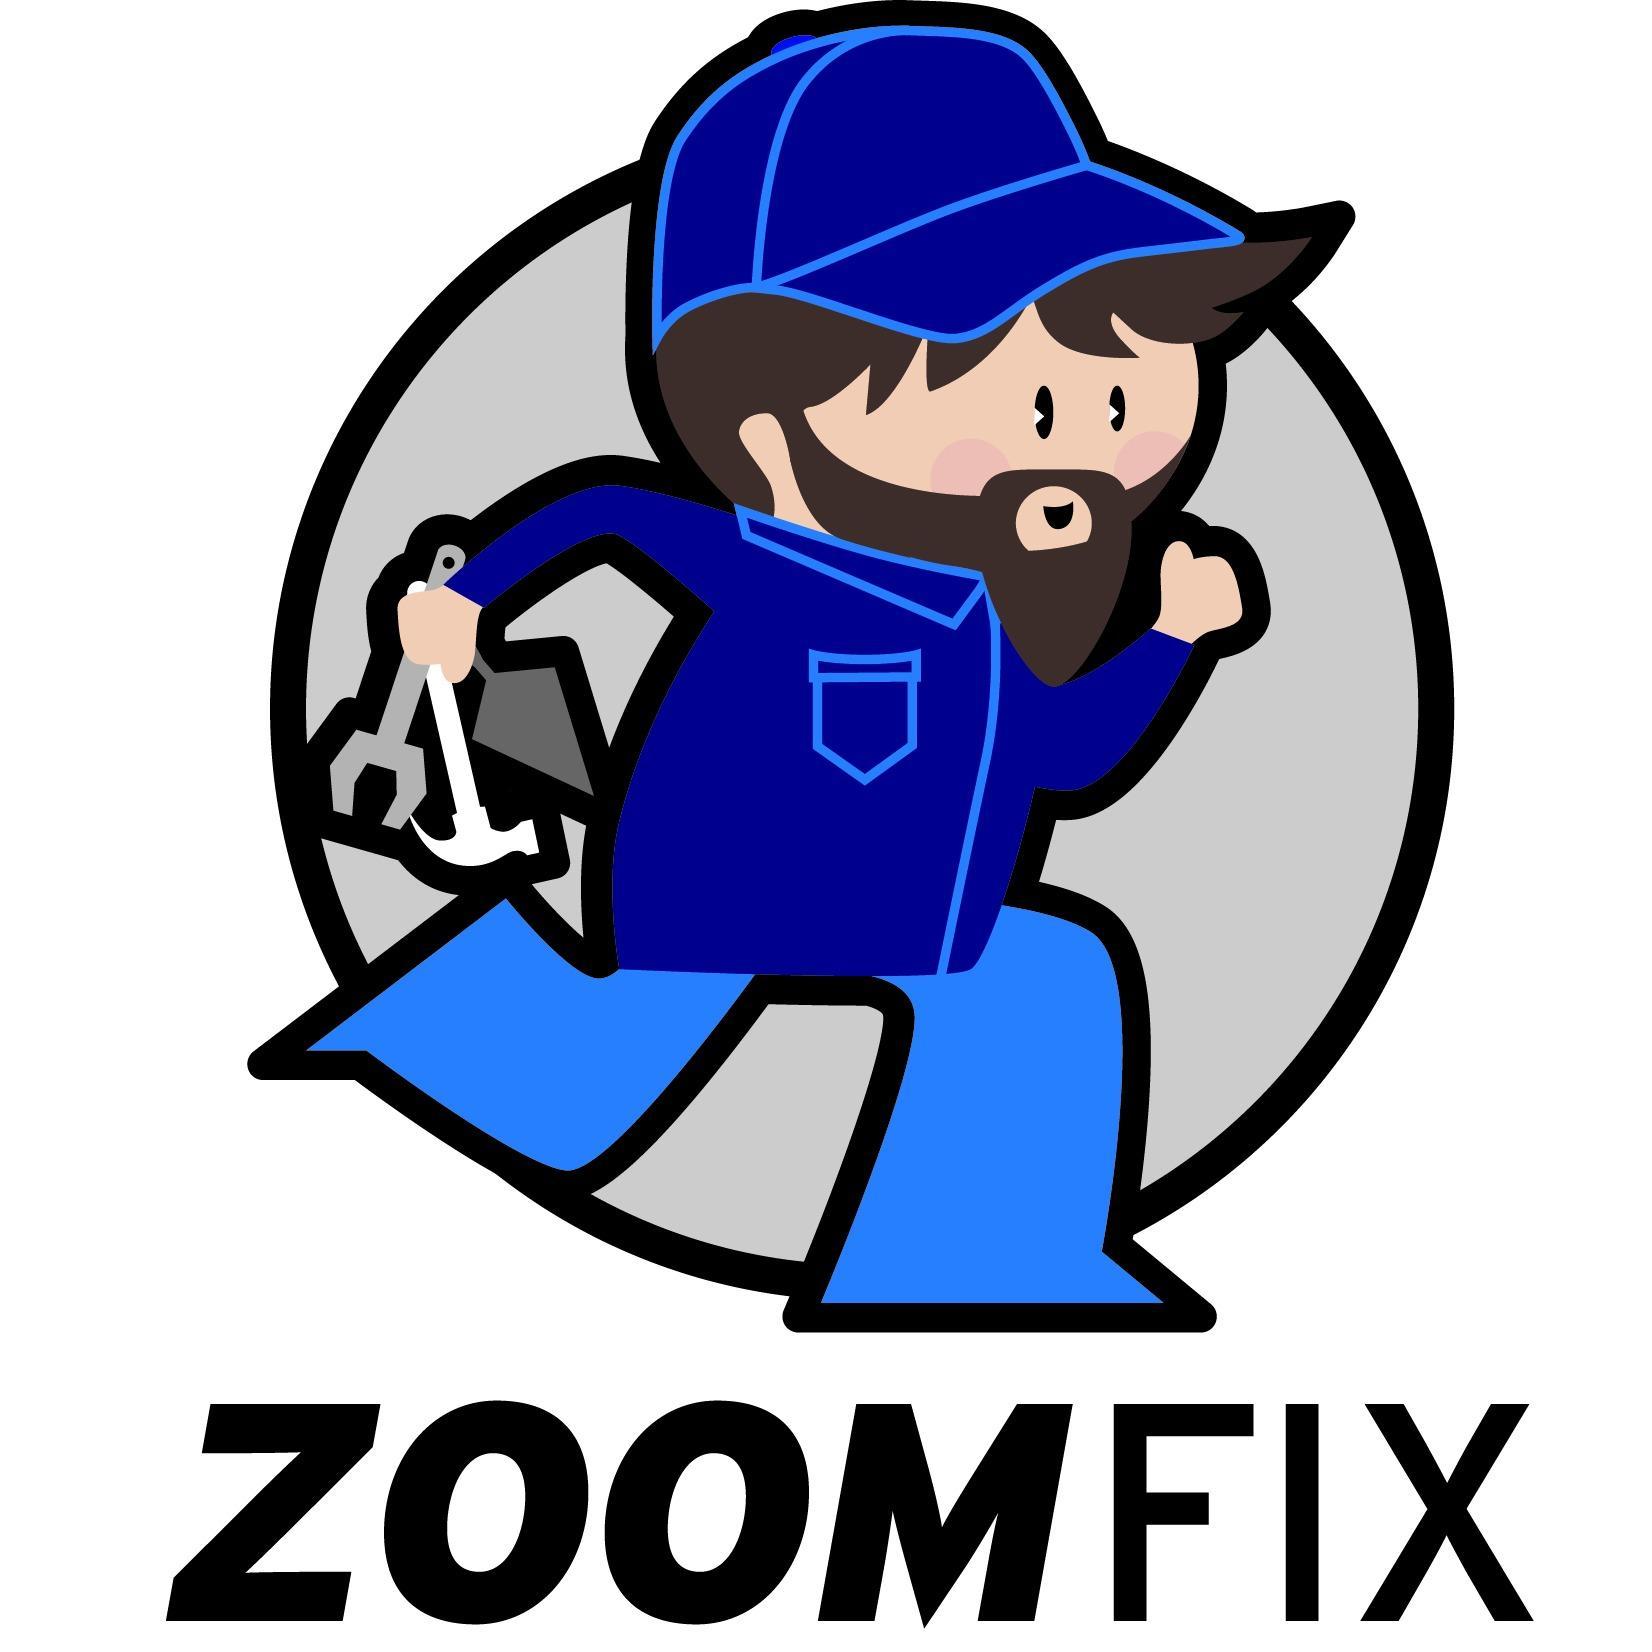 Zoom-Fix Logo